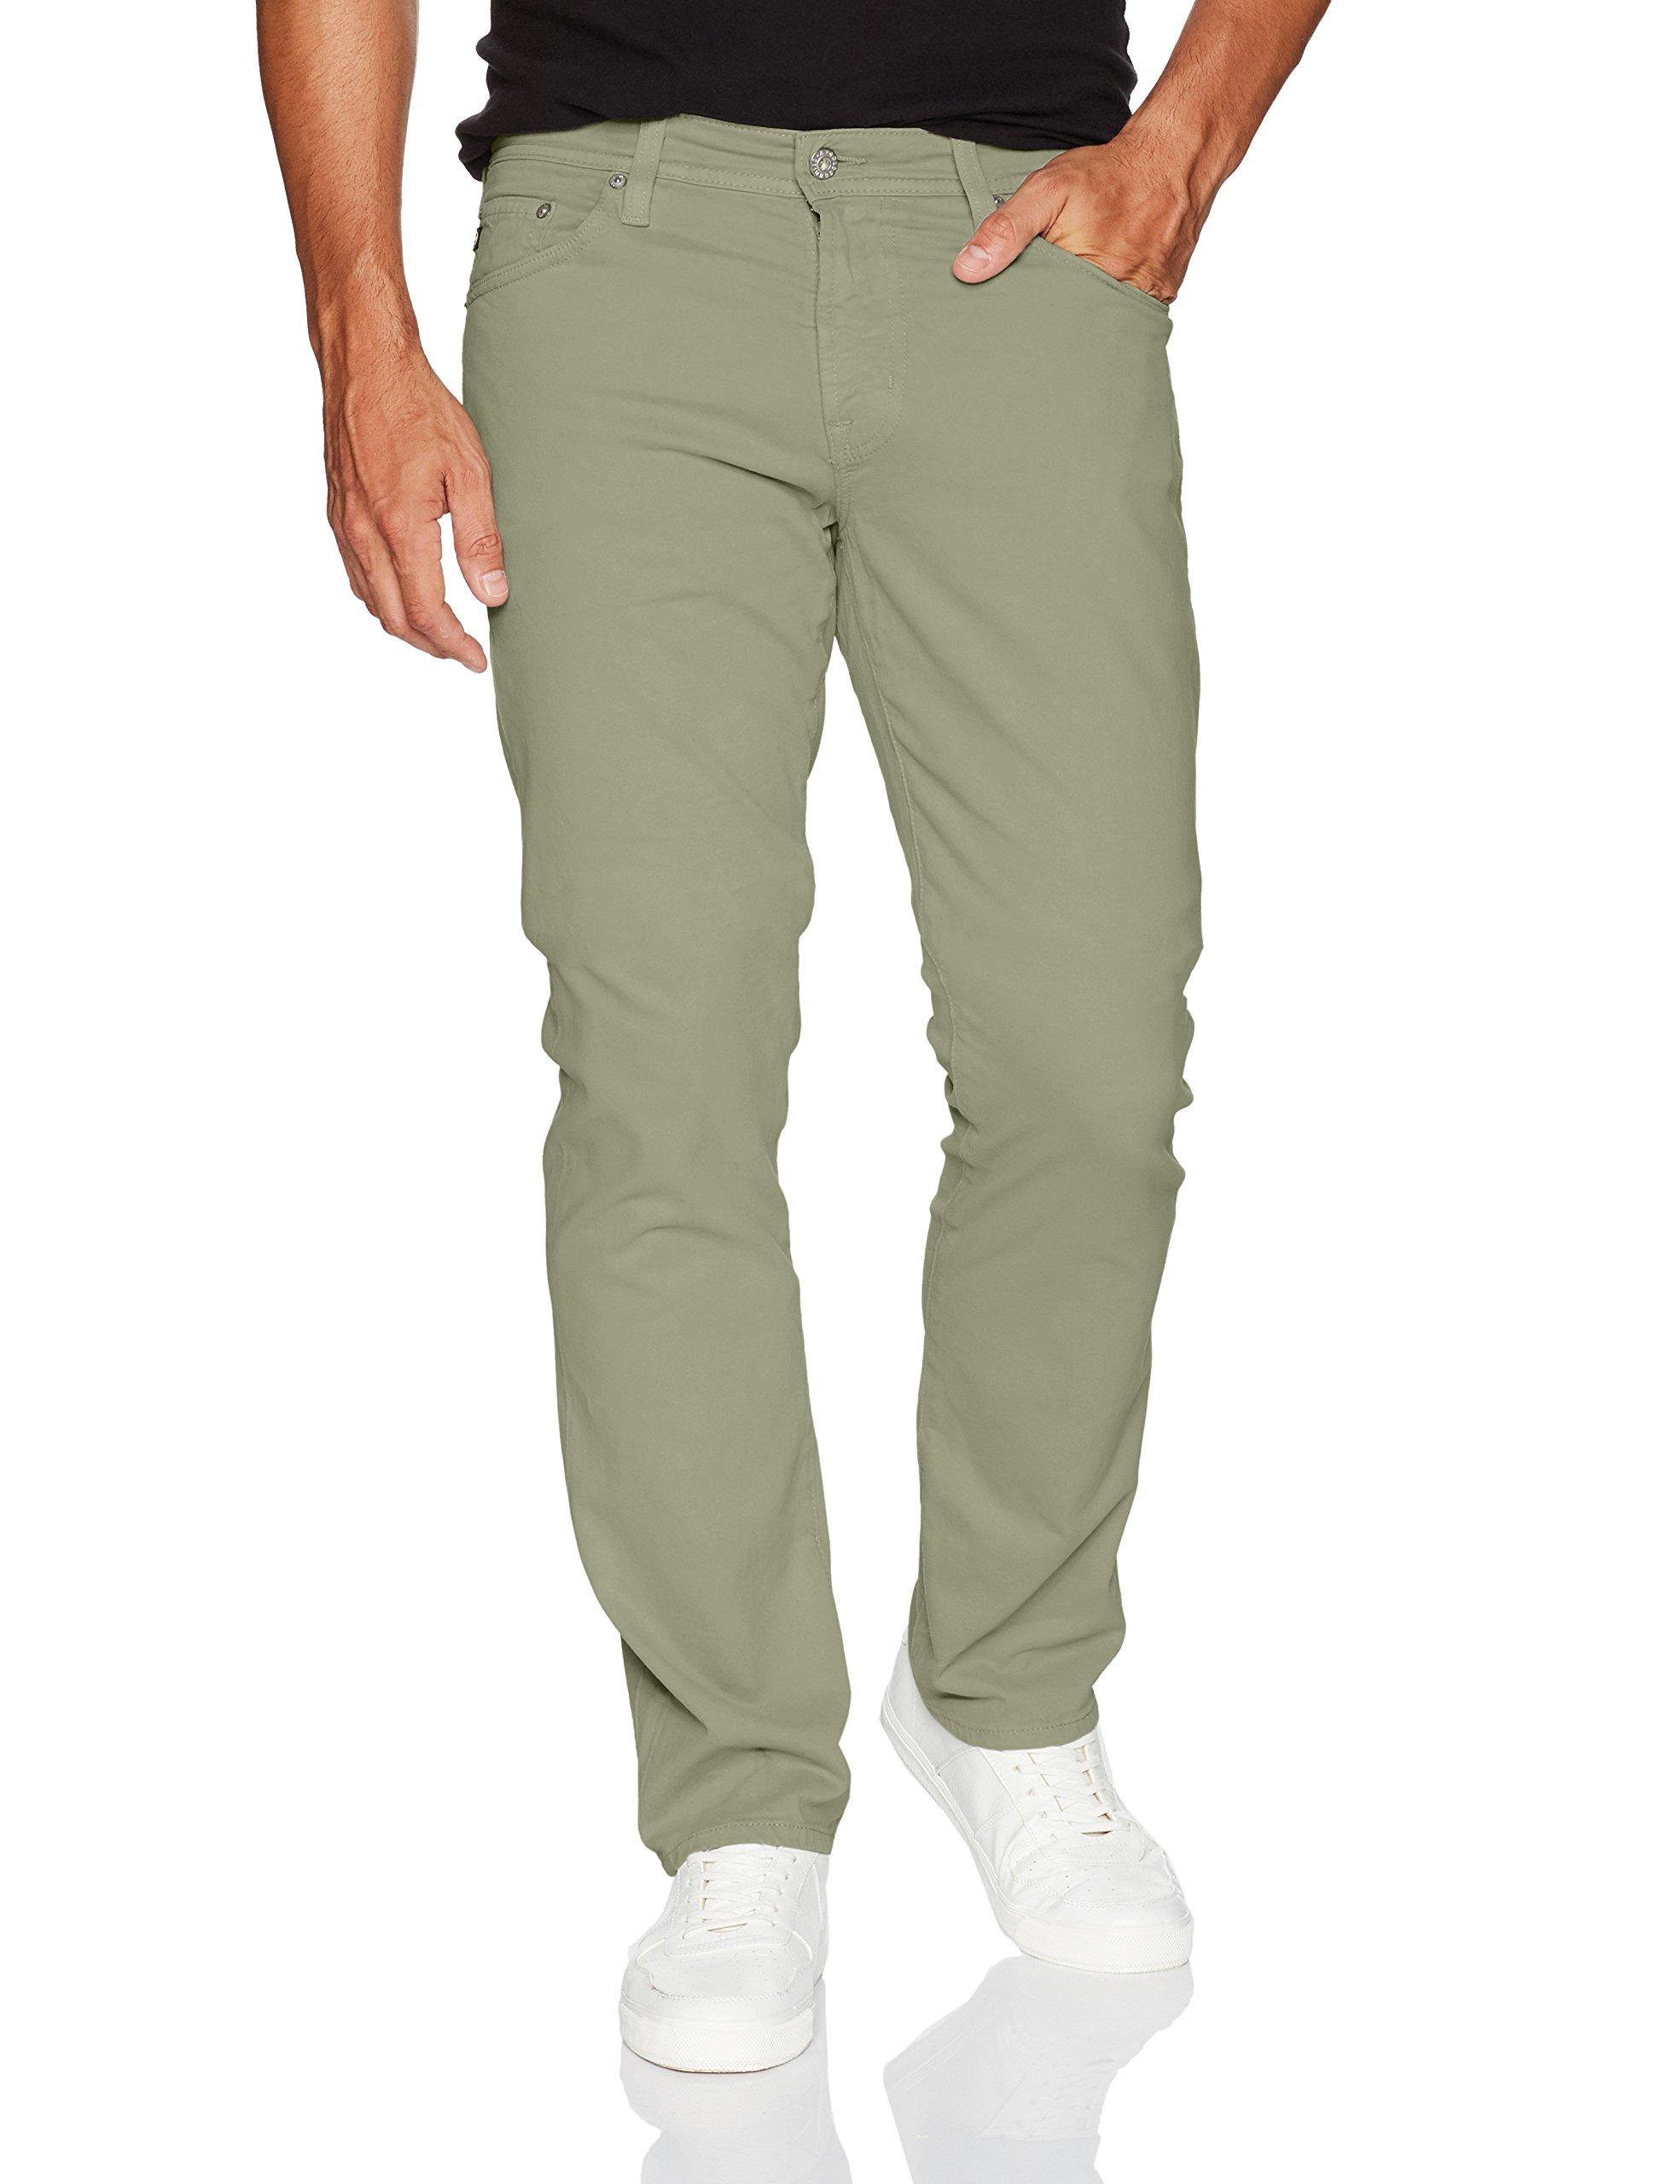 AG Adriano Goldschmied Men's Graduate Tailored Leg SUD Pant, Dry Cypress, 40W x 34L